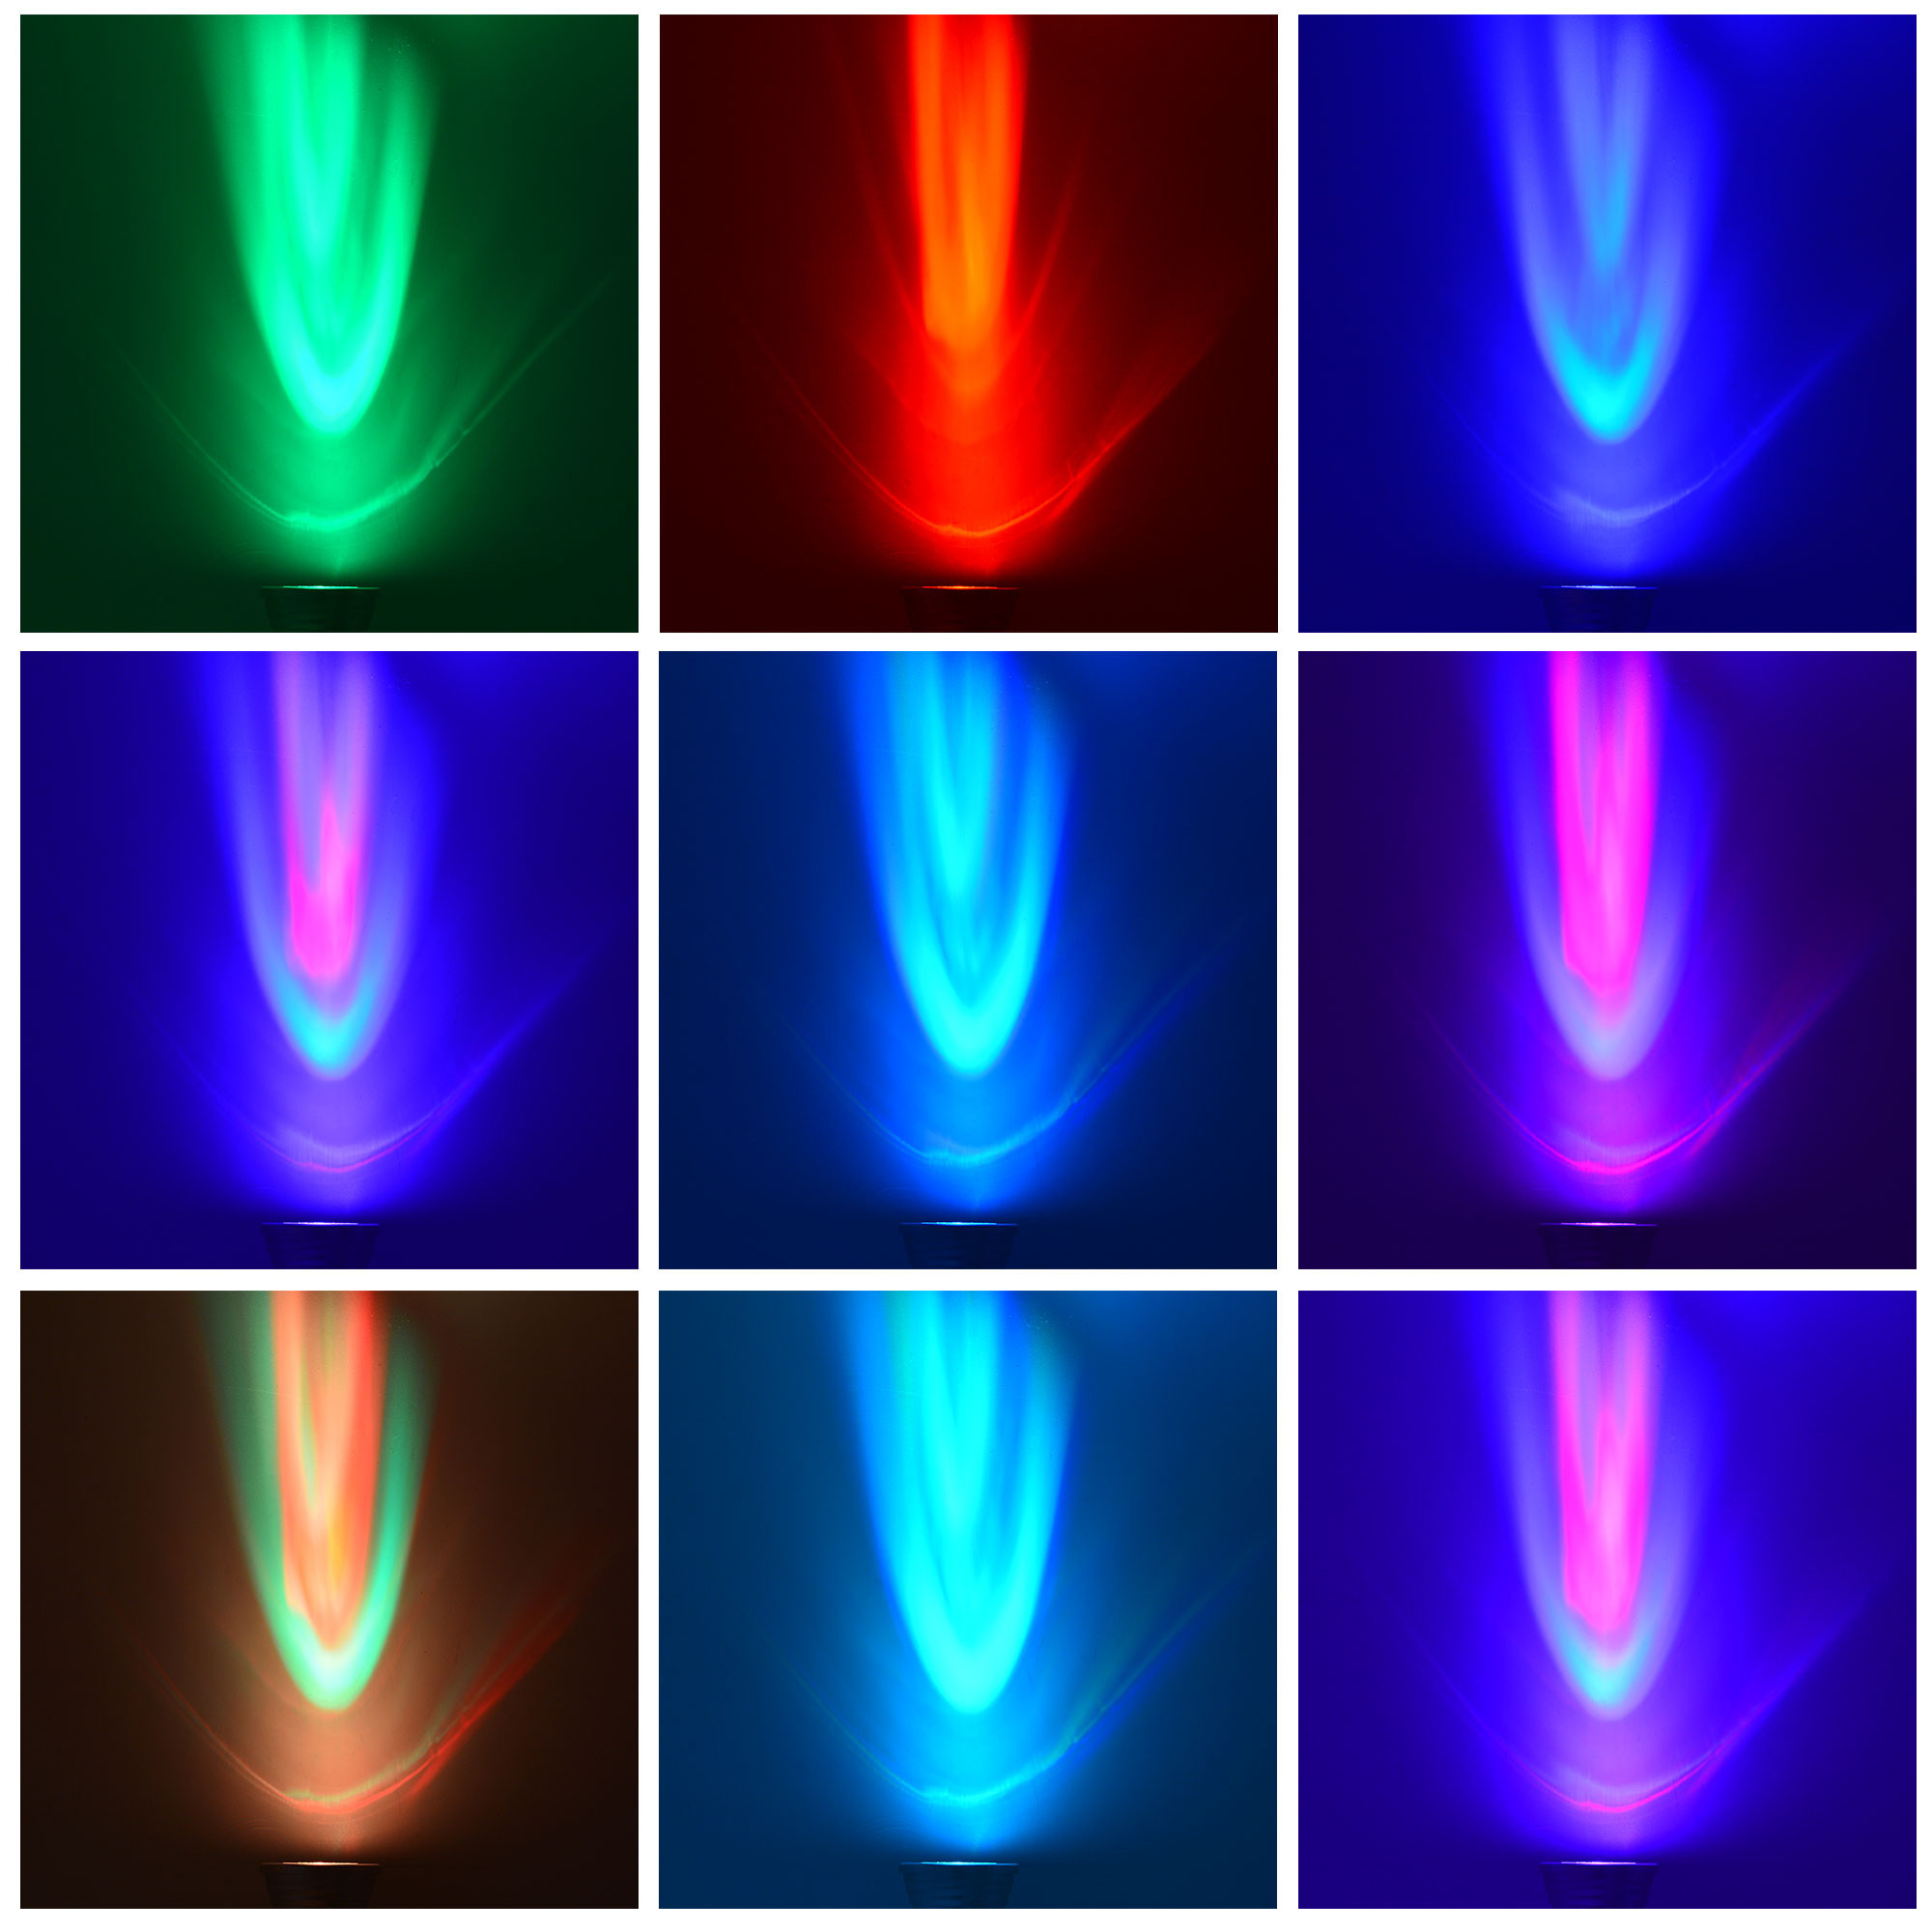 e14 3w led rgb light 16 colour changing smd leds led spotlight lamp bulb with ir remote control. Black Bedroom Furniture Sets. Home Design Ideas